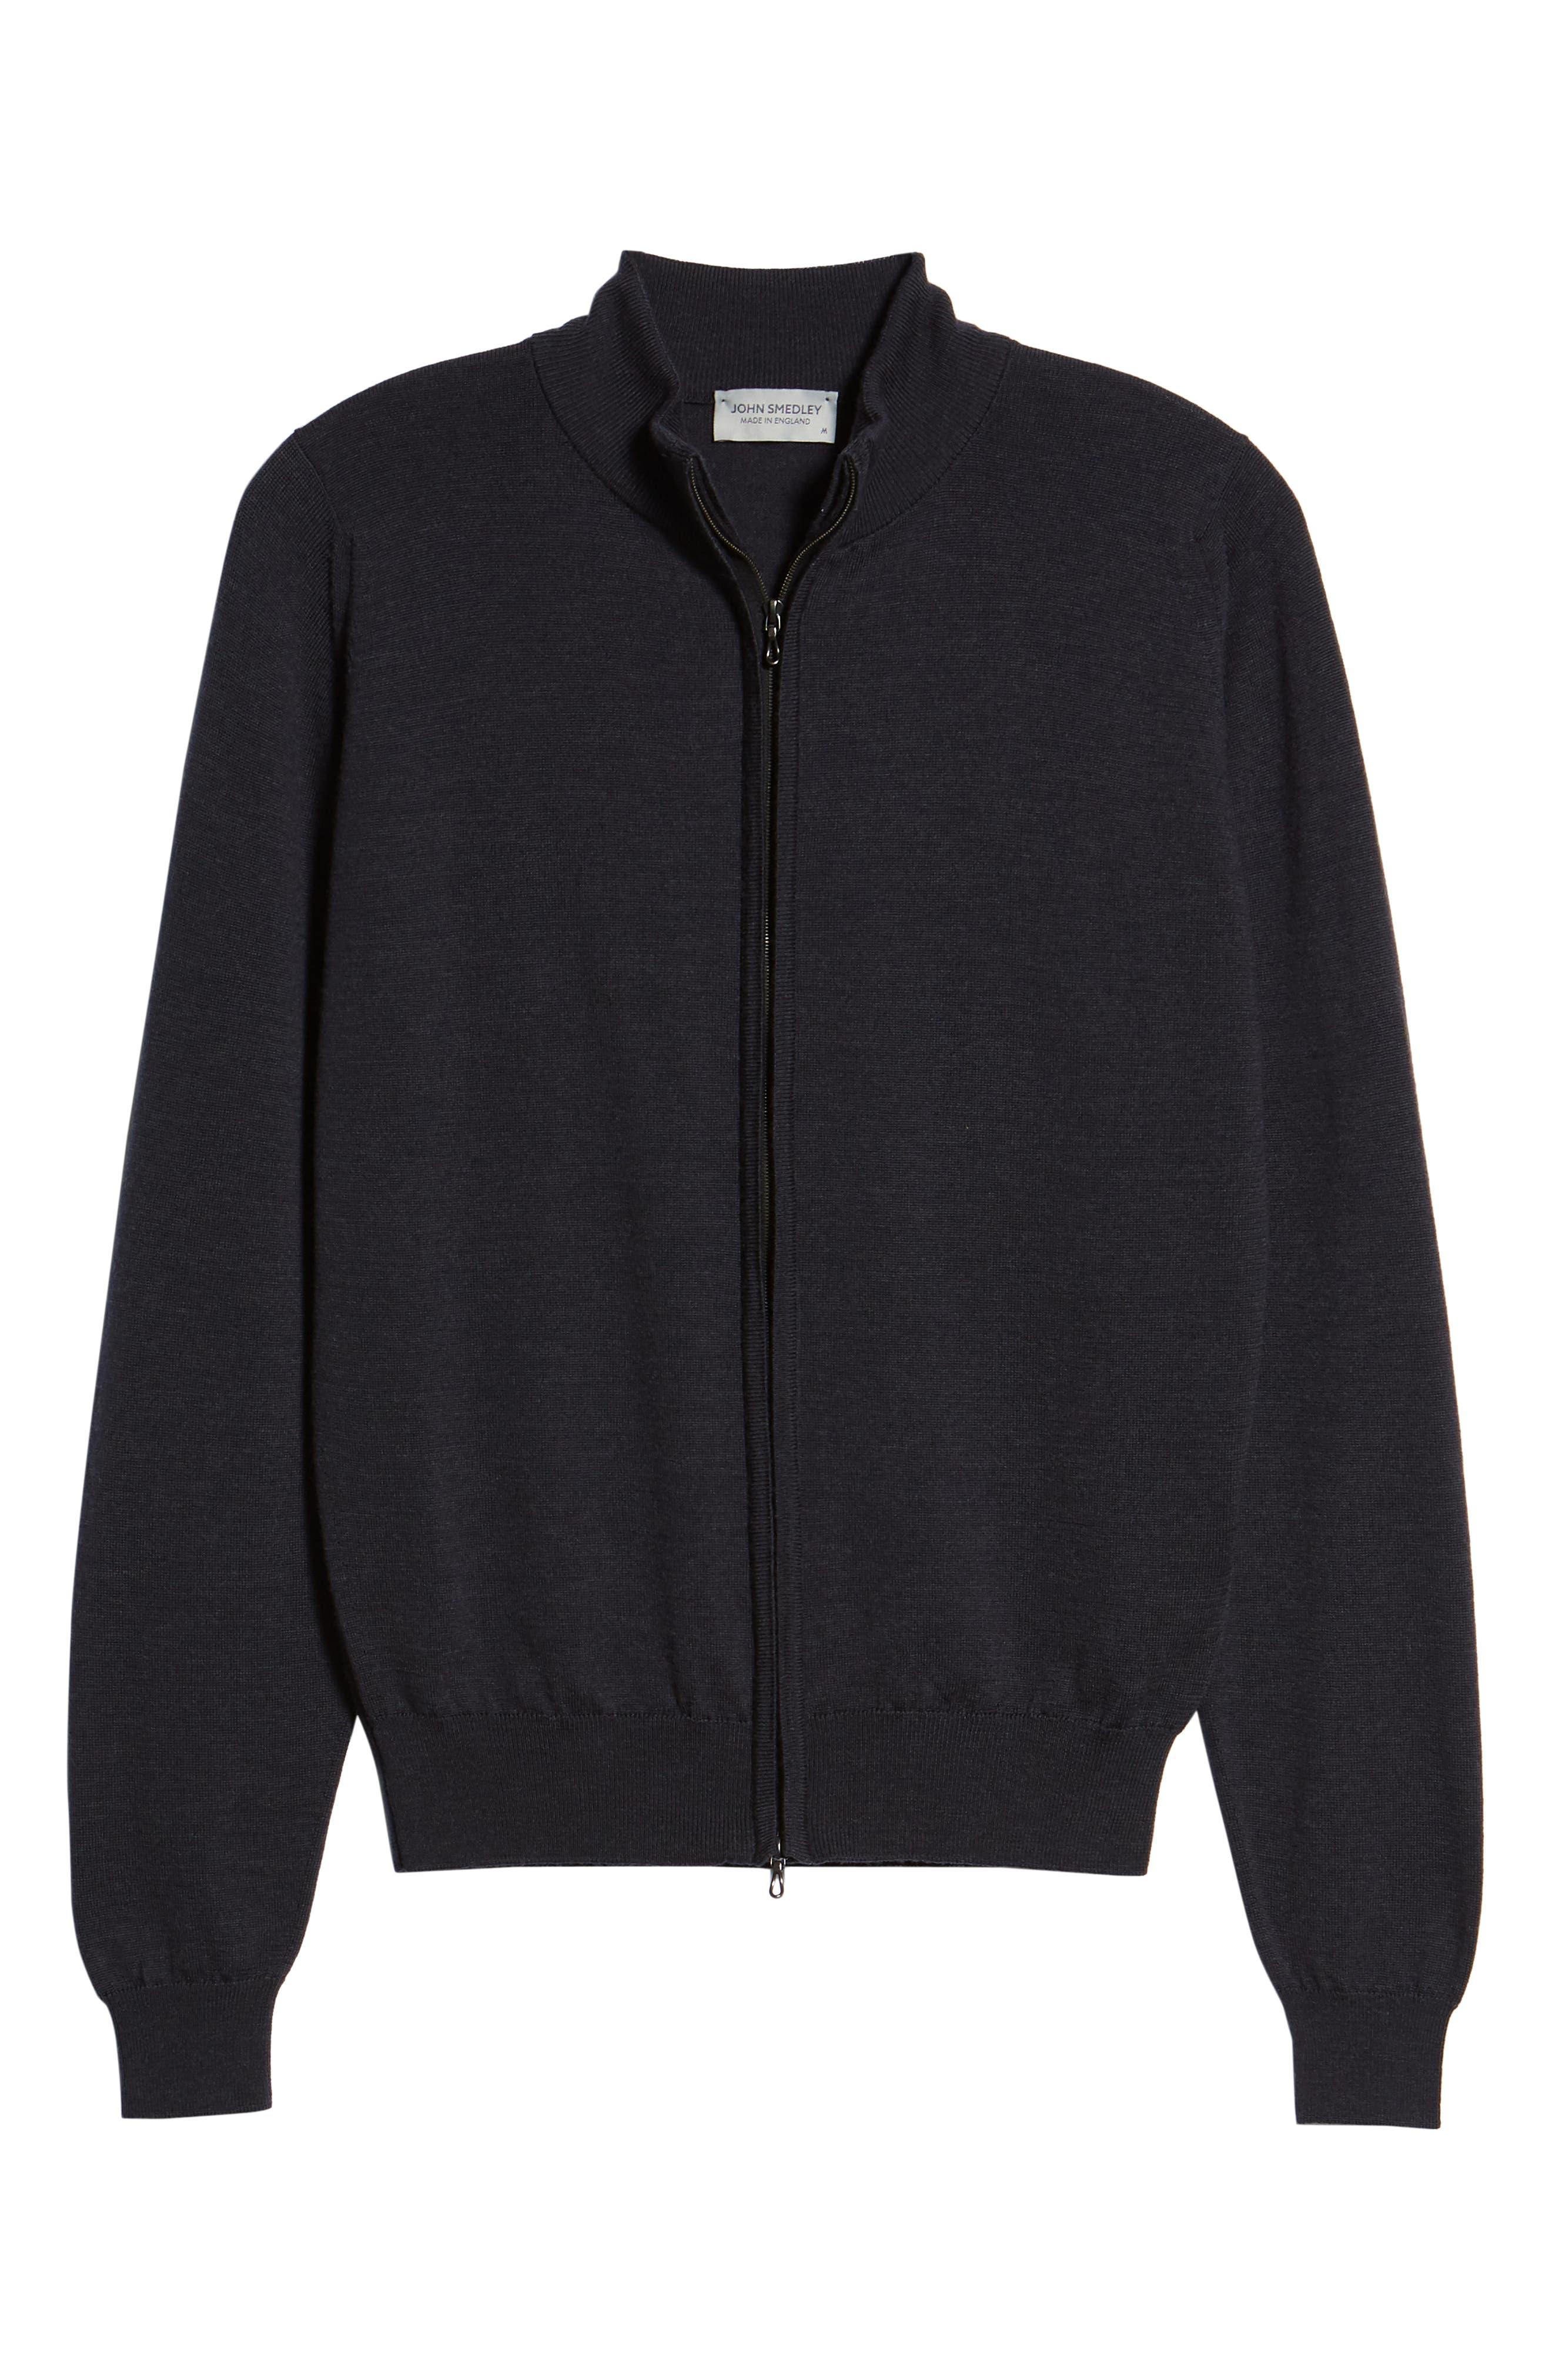 Claygate Slim Fit Merino Wool Zip Jacket,                             Alternate thumbnail 6, color,                             HEPBURN SMOKE